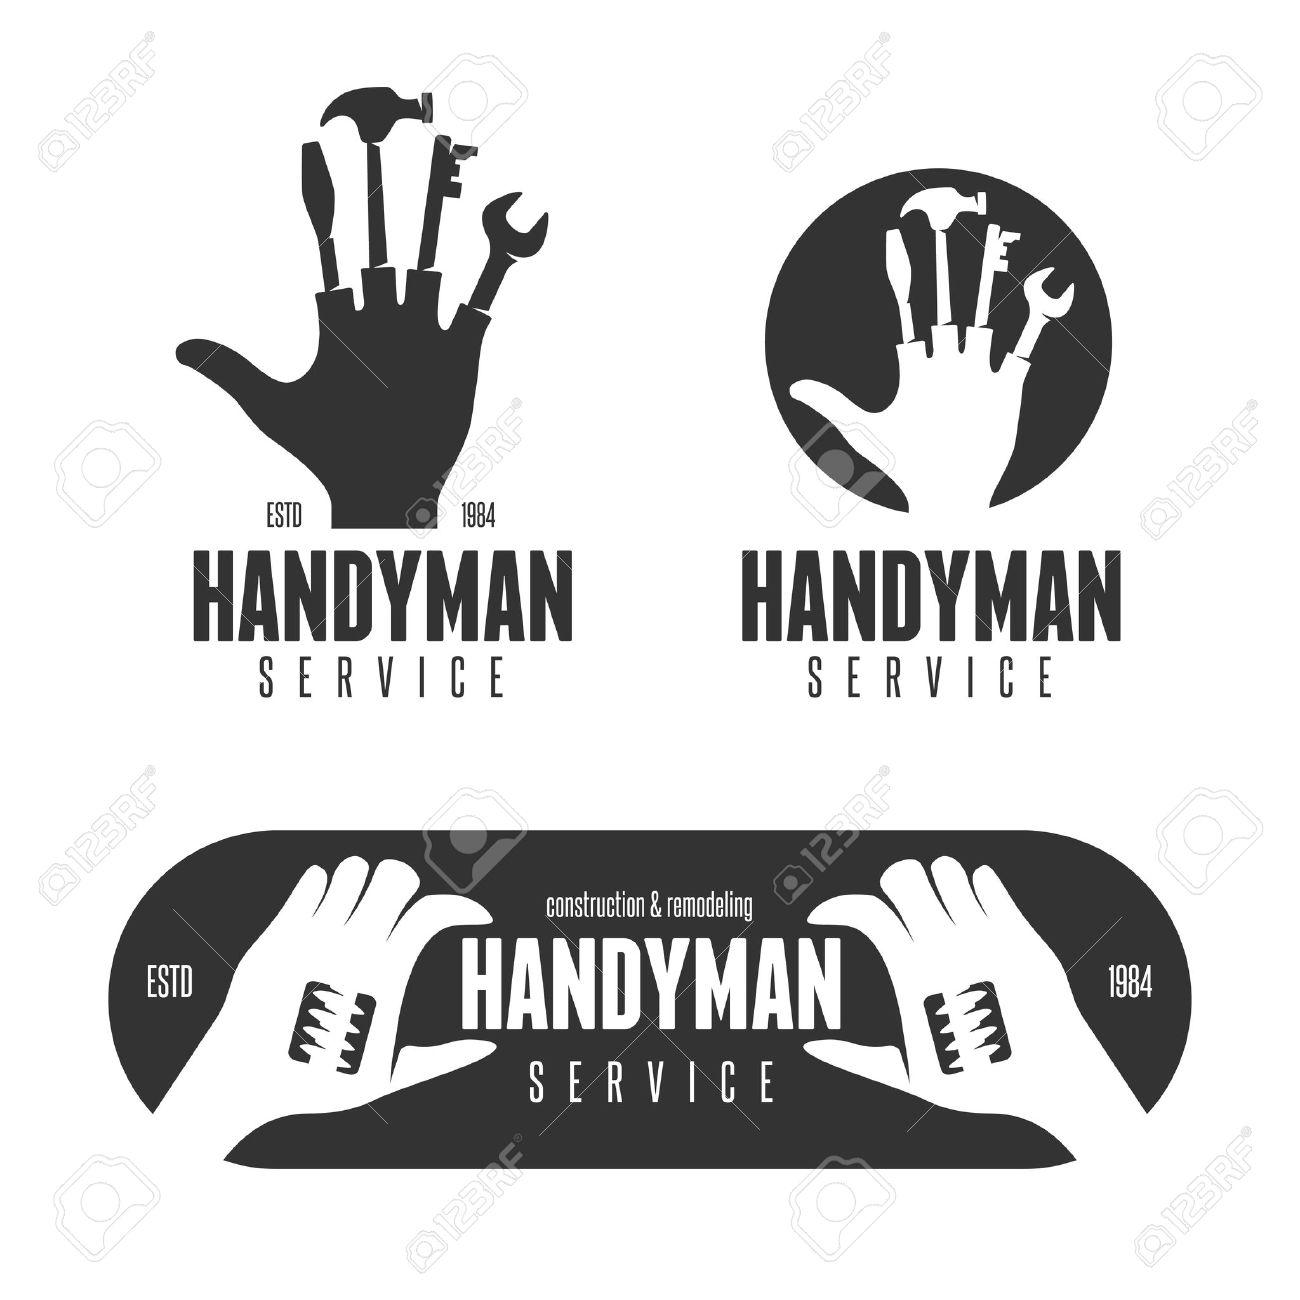 Handyman Design Element In Vintage Style For Logo Royalty Free ...